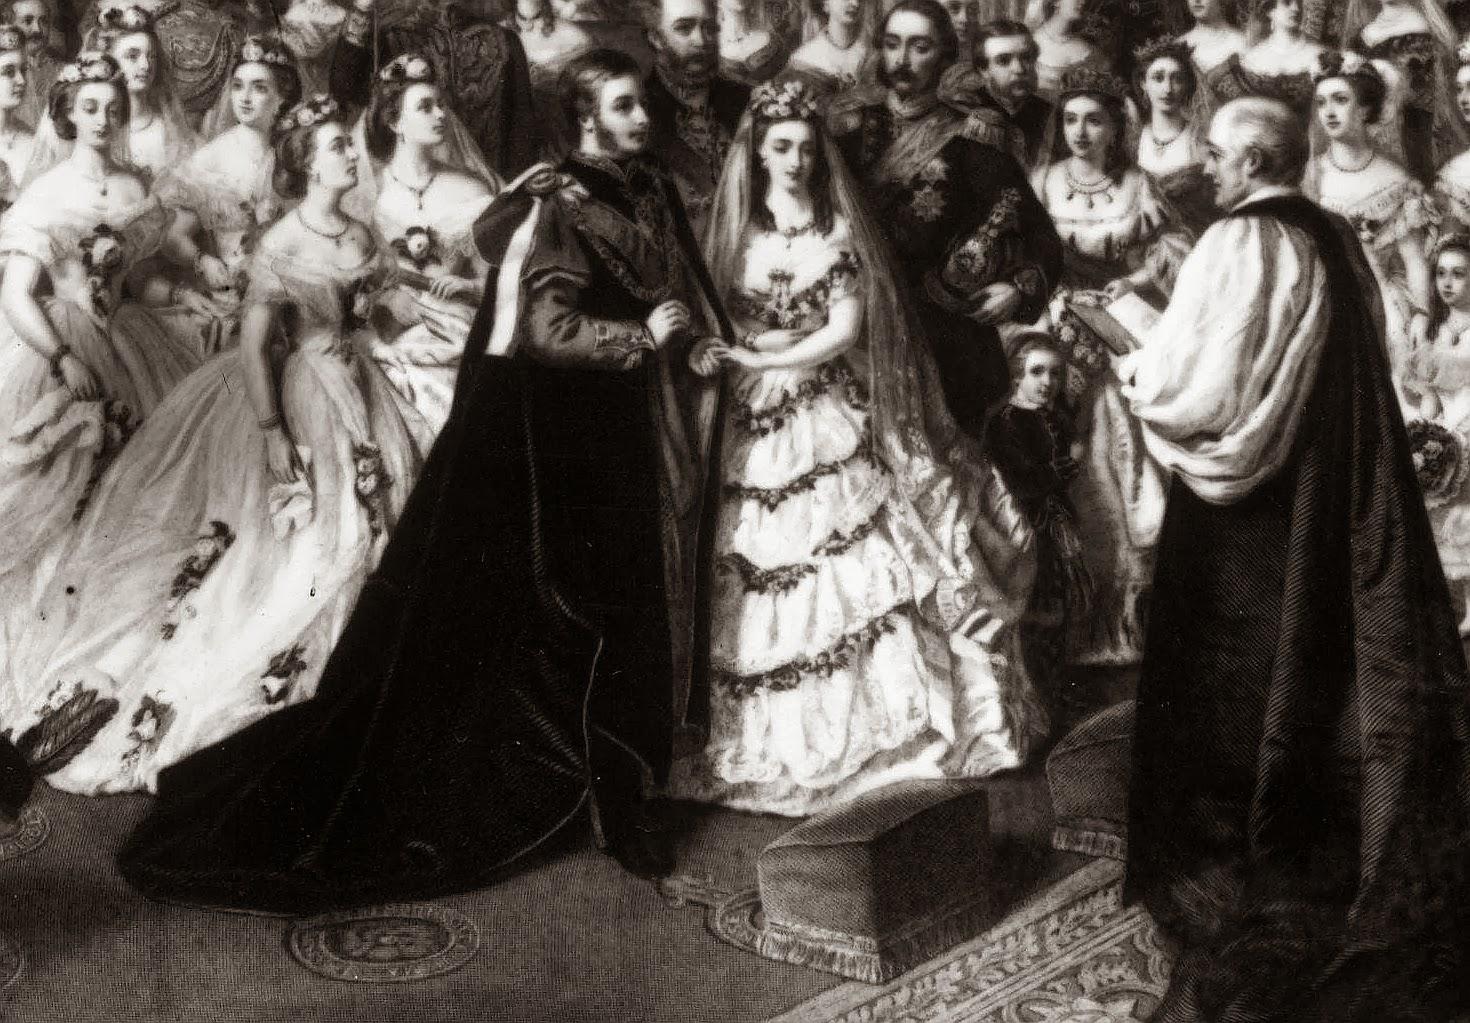 Wedding - Alexandra to Edward VII - Windsor 1863 | Glucksburg